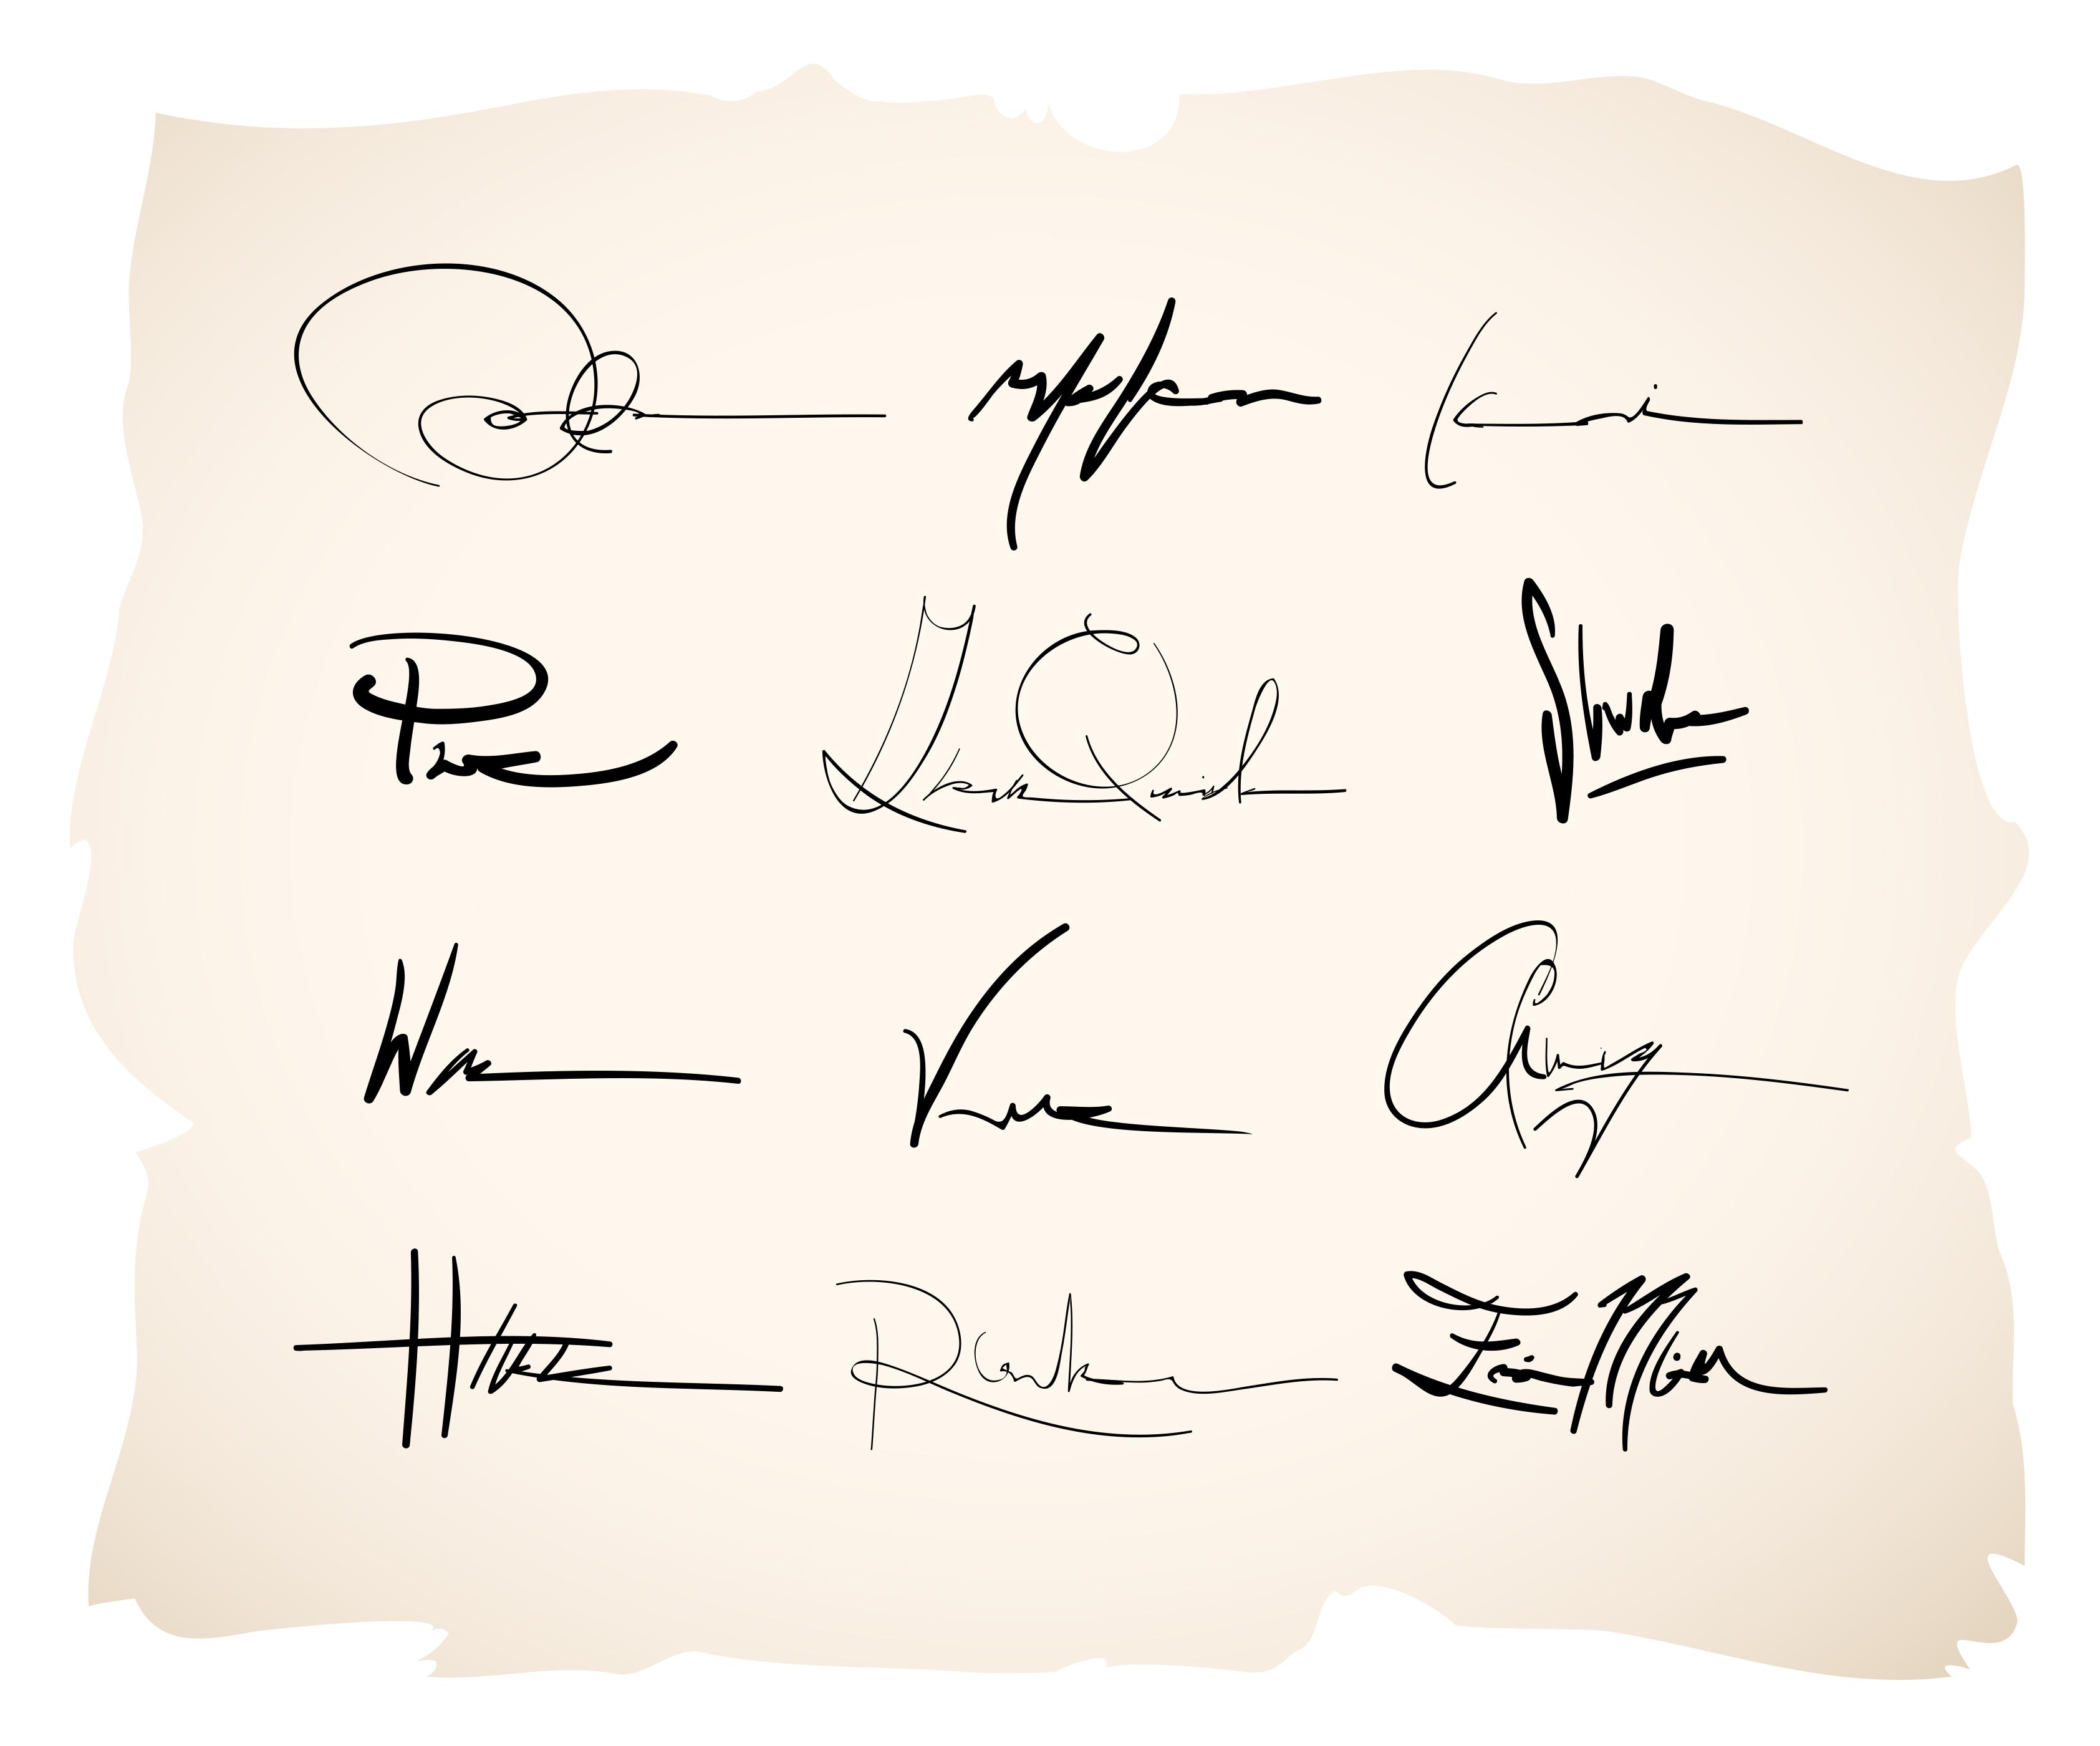 An Original Signature Means an Original Signature – Attorney